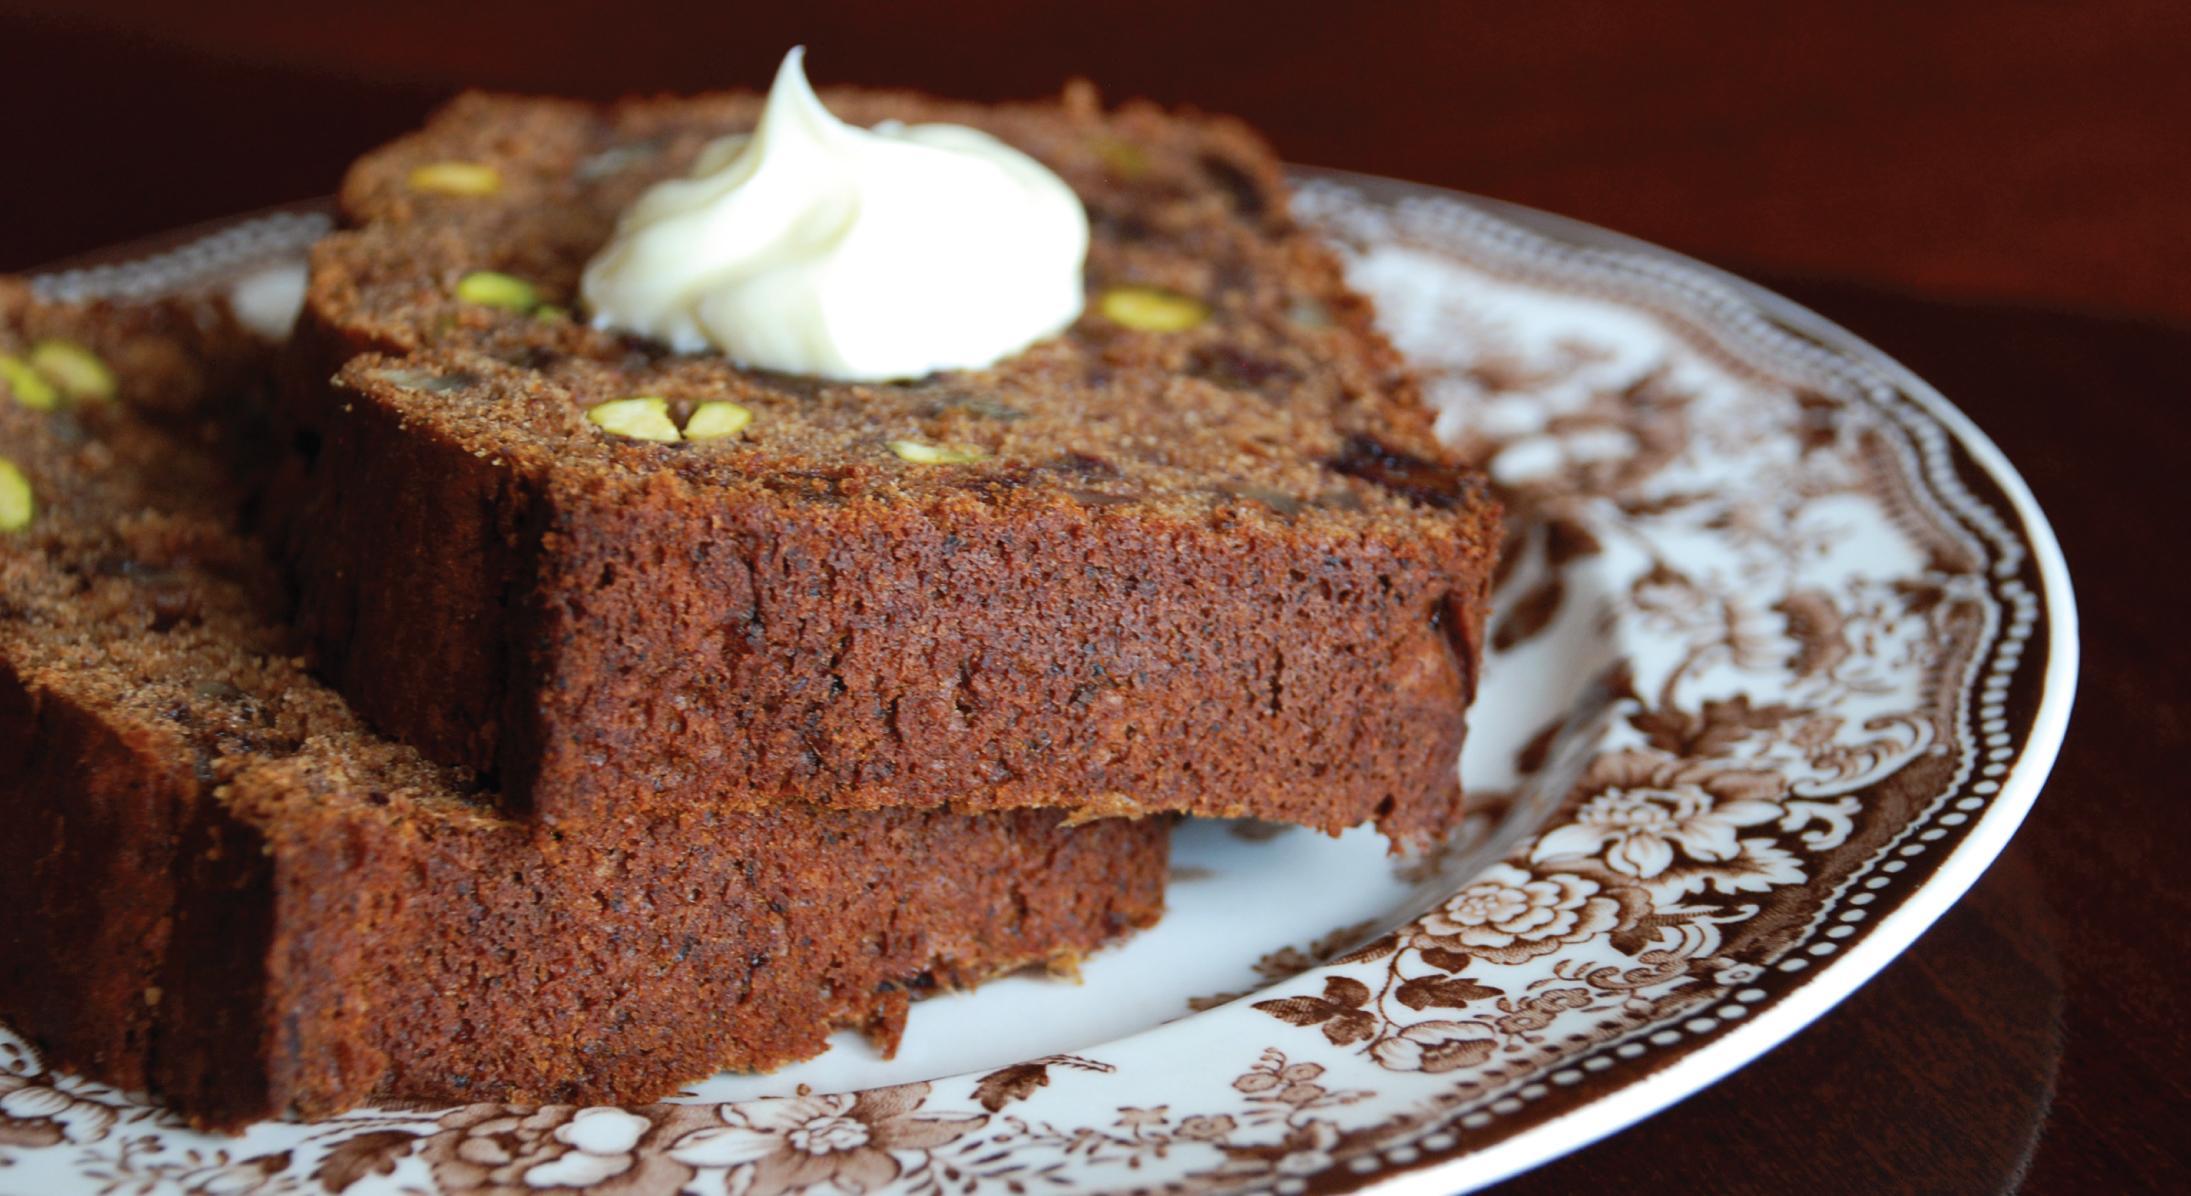 Shiloh Farms Date Nut Bread (w/ Spelt Flour & Deglet Dates)